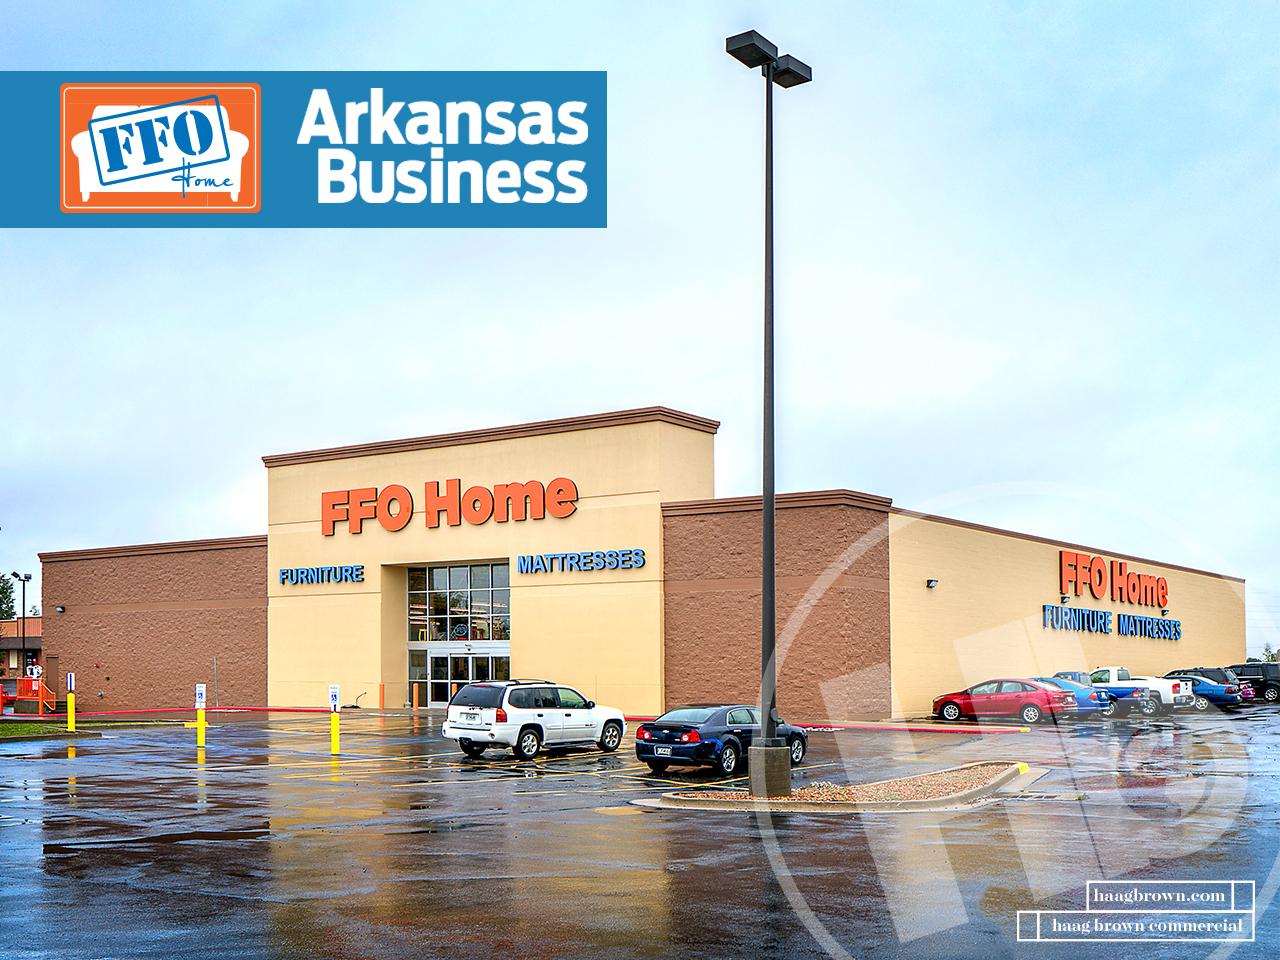 FFO Home Acquires Service Furniture & Bedding Inc.